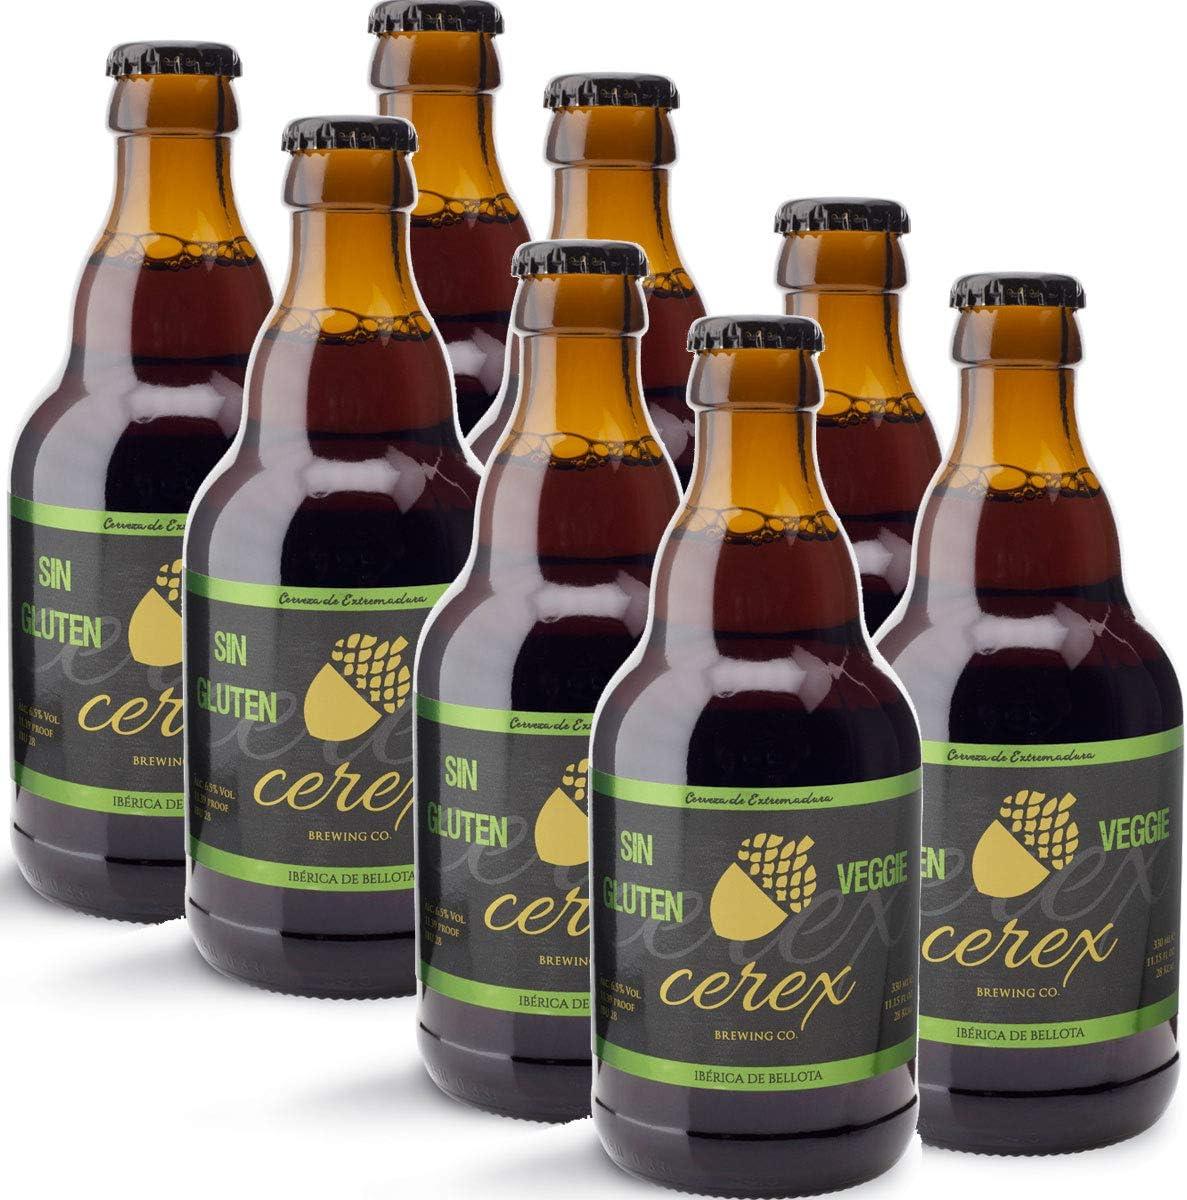 CEREX – Pack Cervezas Artesanas Sin Gluten Sabor Ibérica de Bellota - Cervezas de 33cl. - Mejor Cerveza Artesanal de España Premios